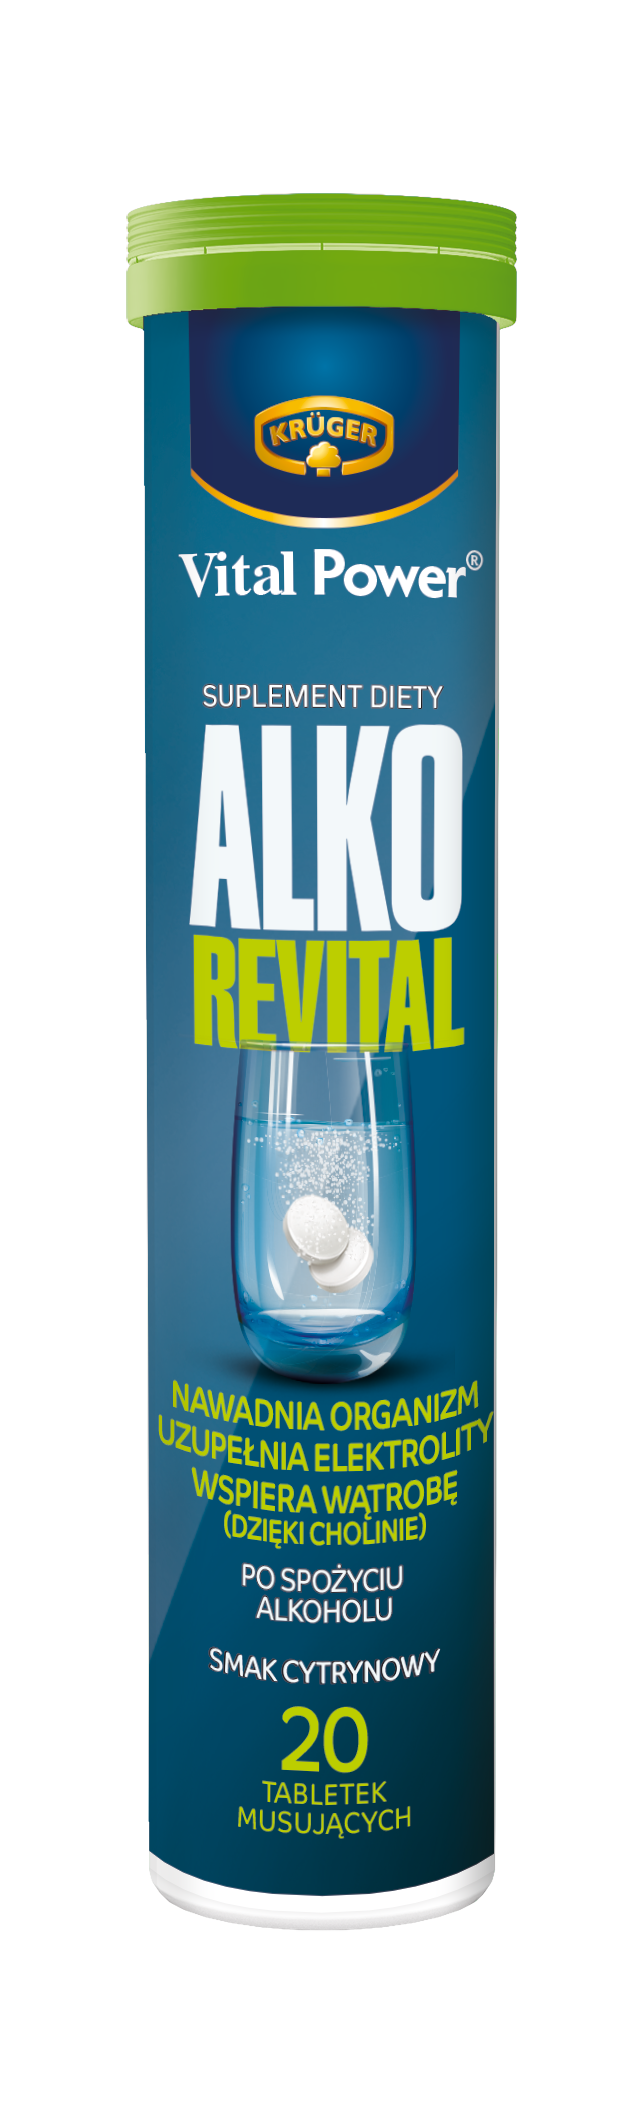 Kruger Effervescent alcohol revital tablets with lemon flavor dietary supplement